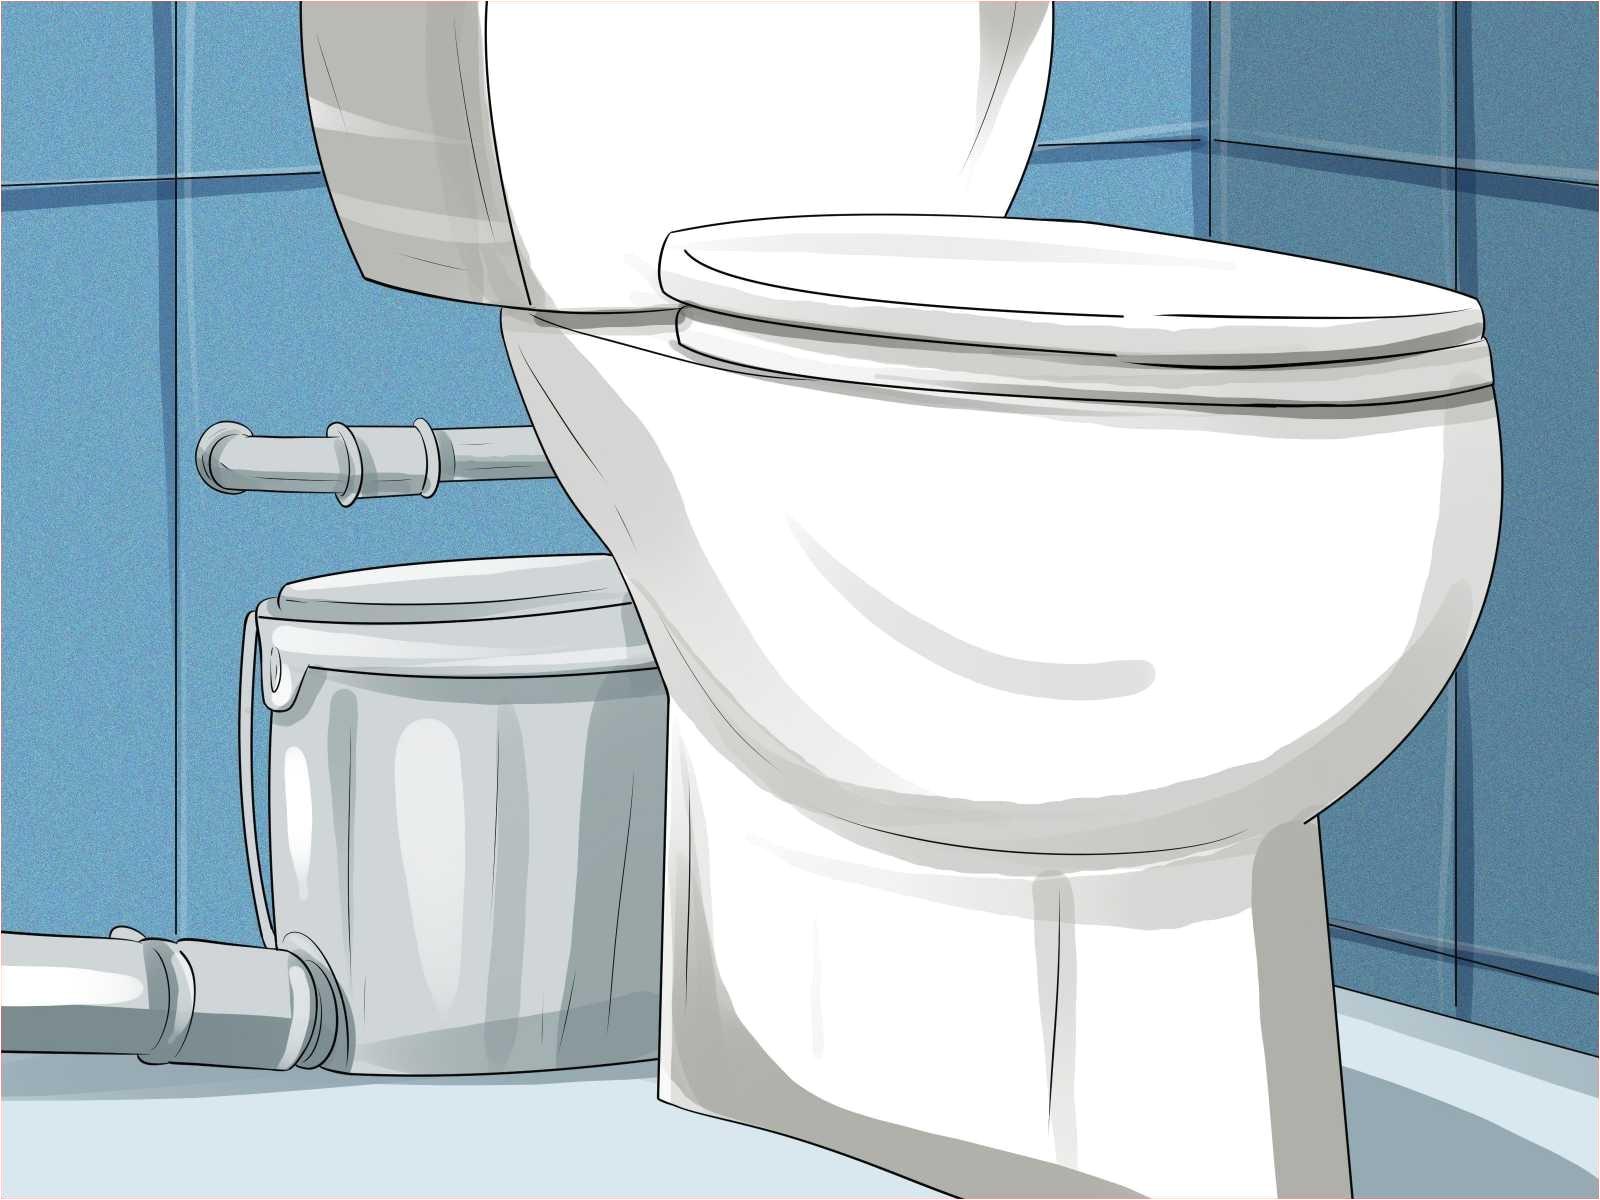 reglaze bathtub cost lovely bathtub reglazing nj inspirational shower drain plumbing elegant 0d